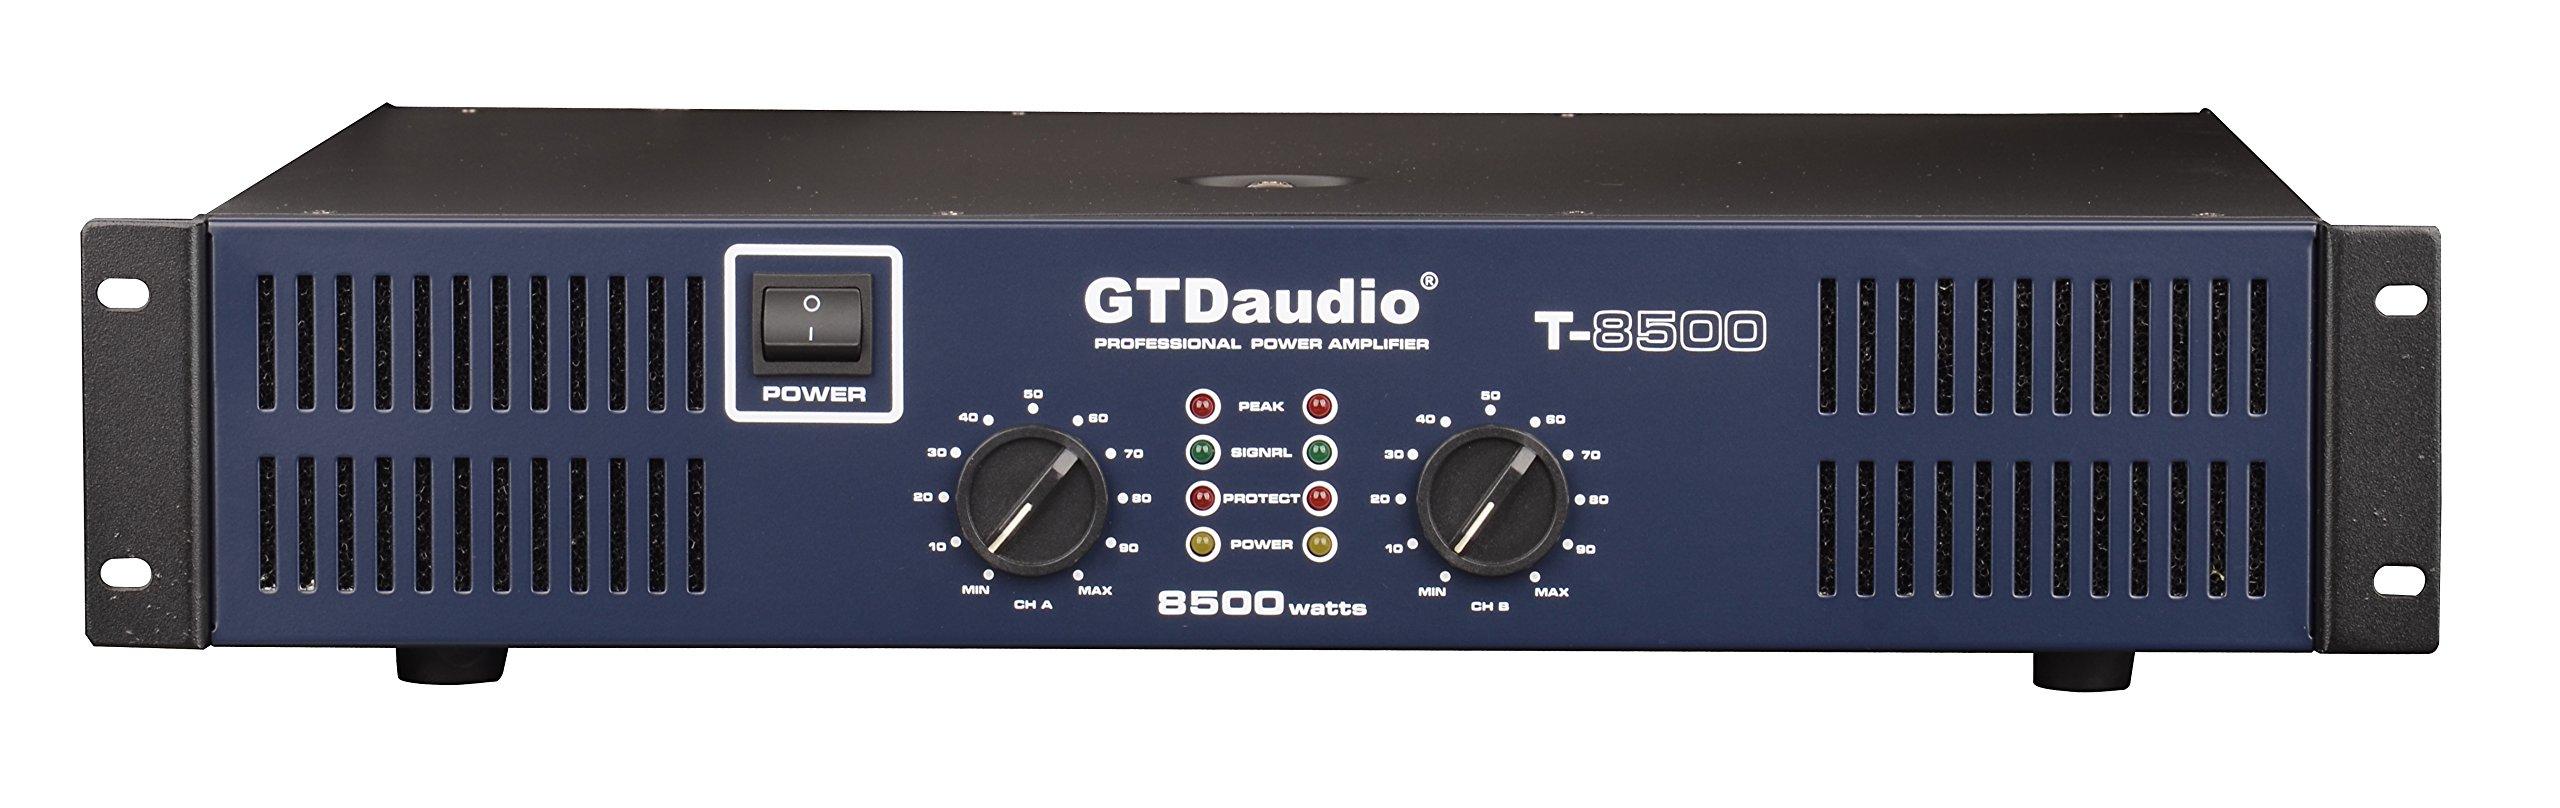 GTD Audio 2 Channel 8500 Watts 2U Stereo Professional Power Amplifier AMP by GTDaudio